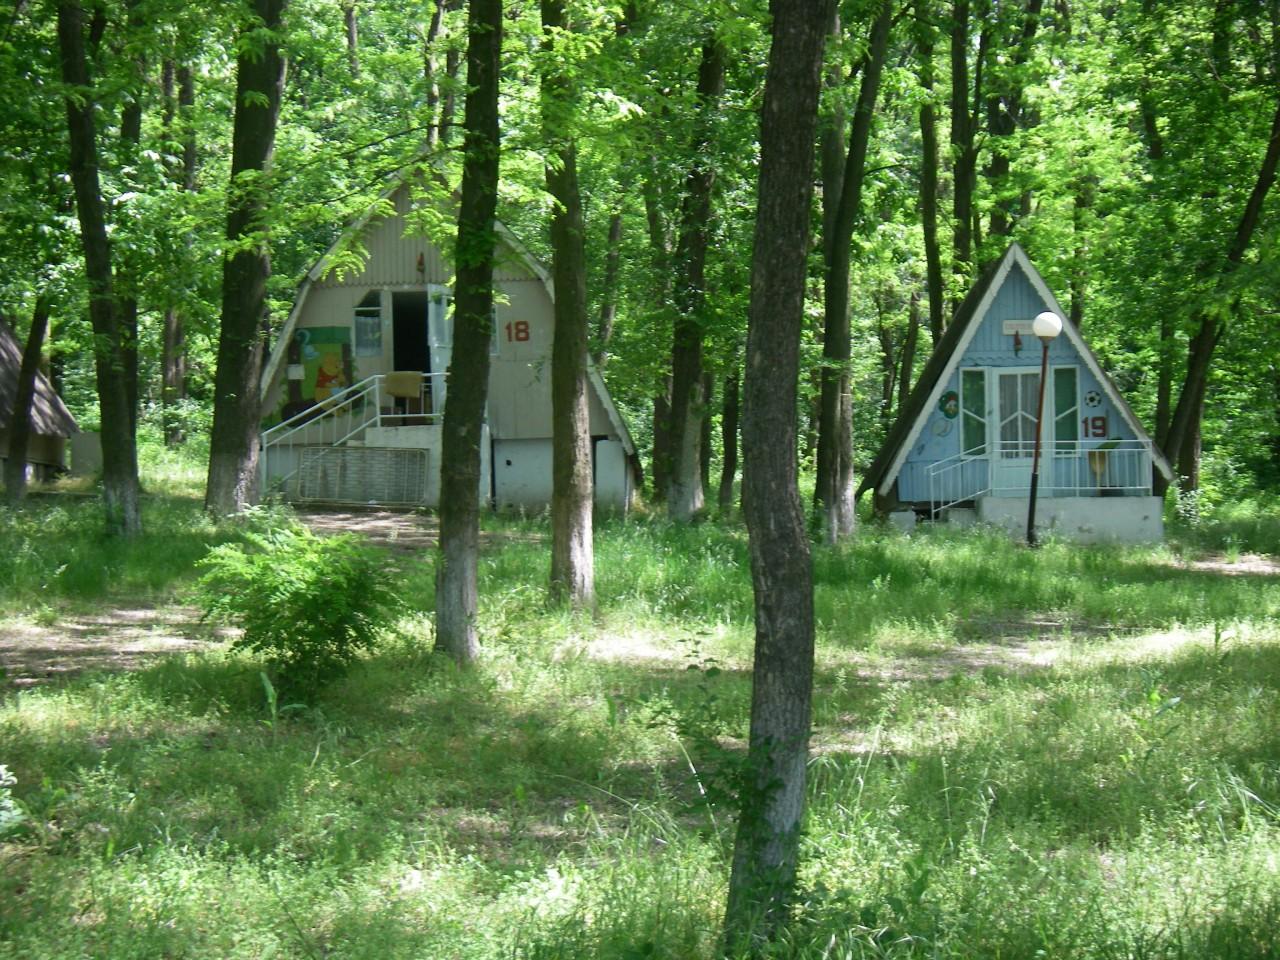 Moldawien-Reise 2014: Sommercamp Neemia in Cimiseni